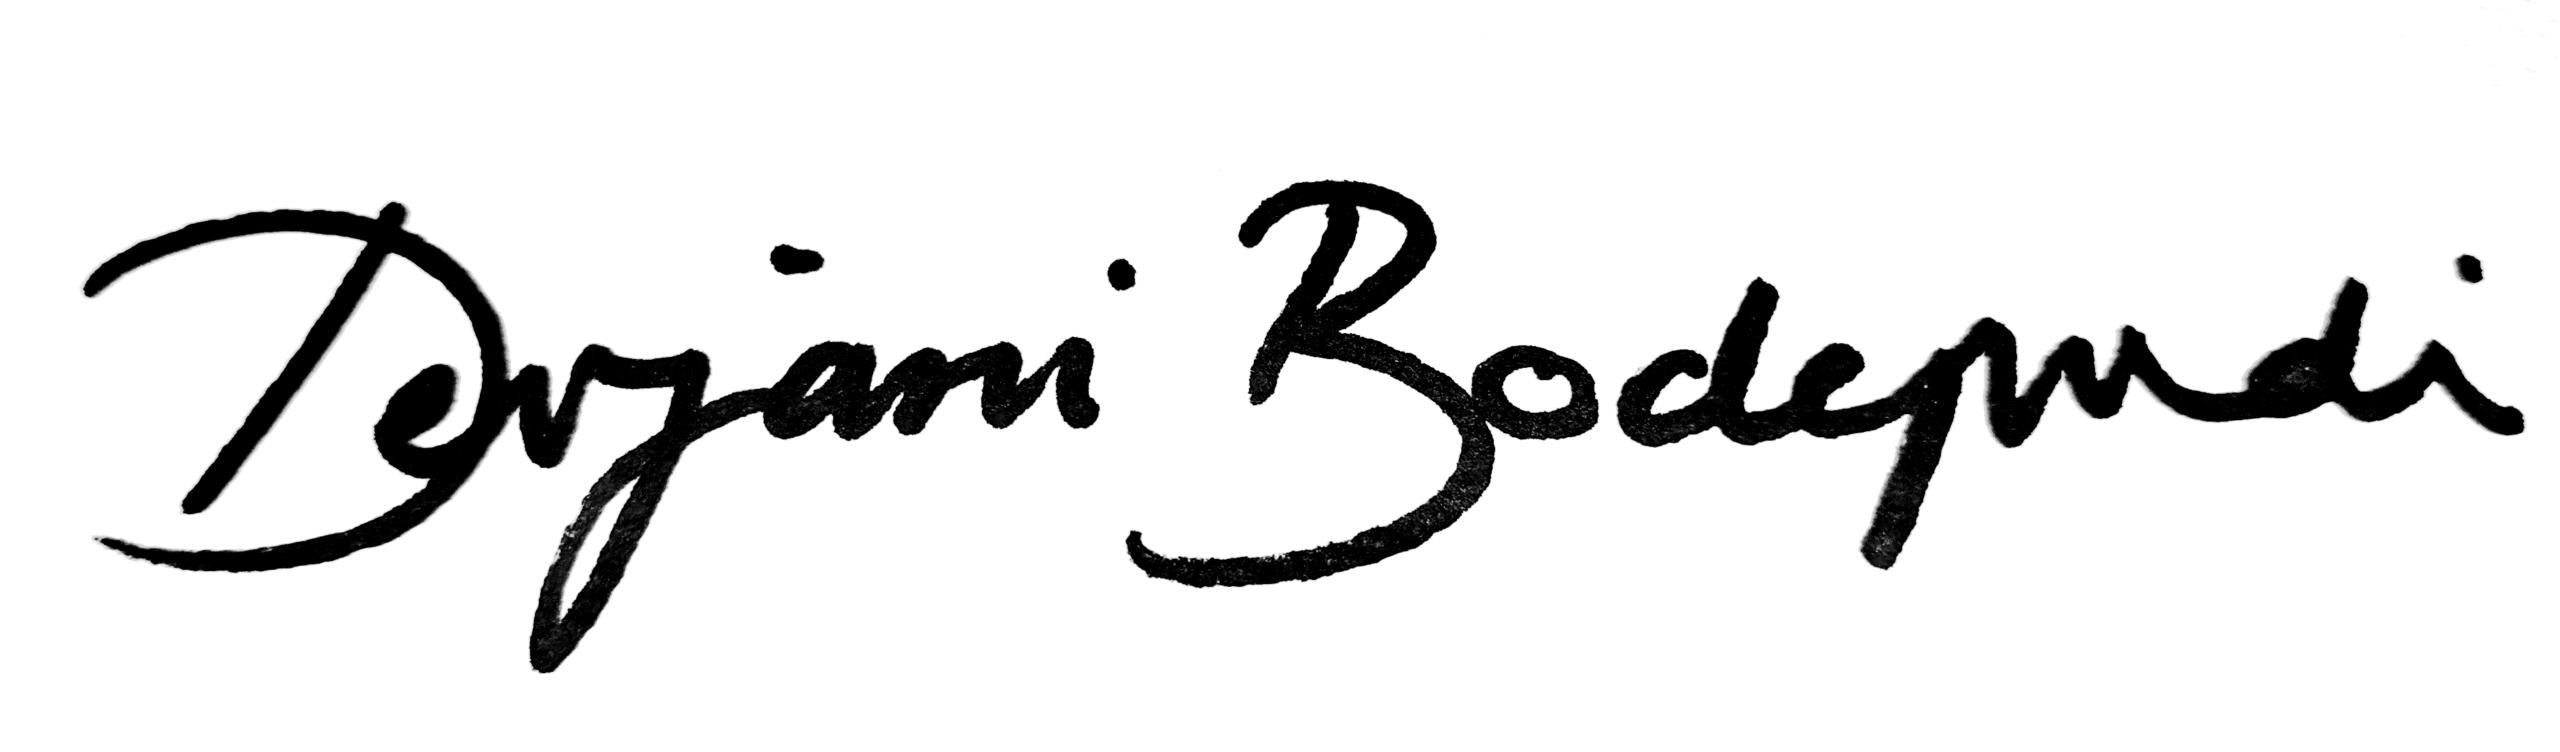 Devjani Bodepudi